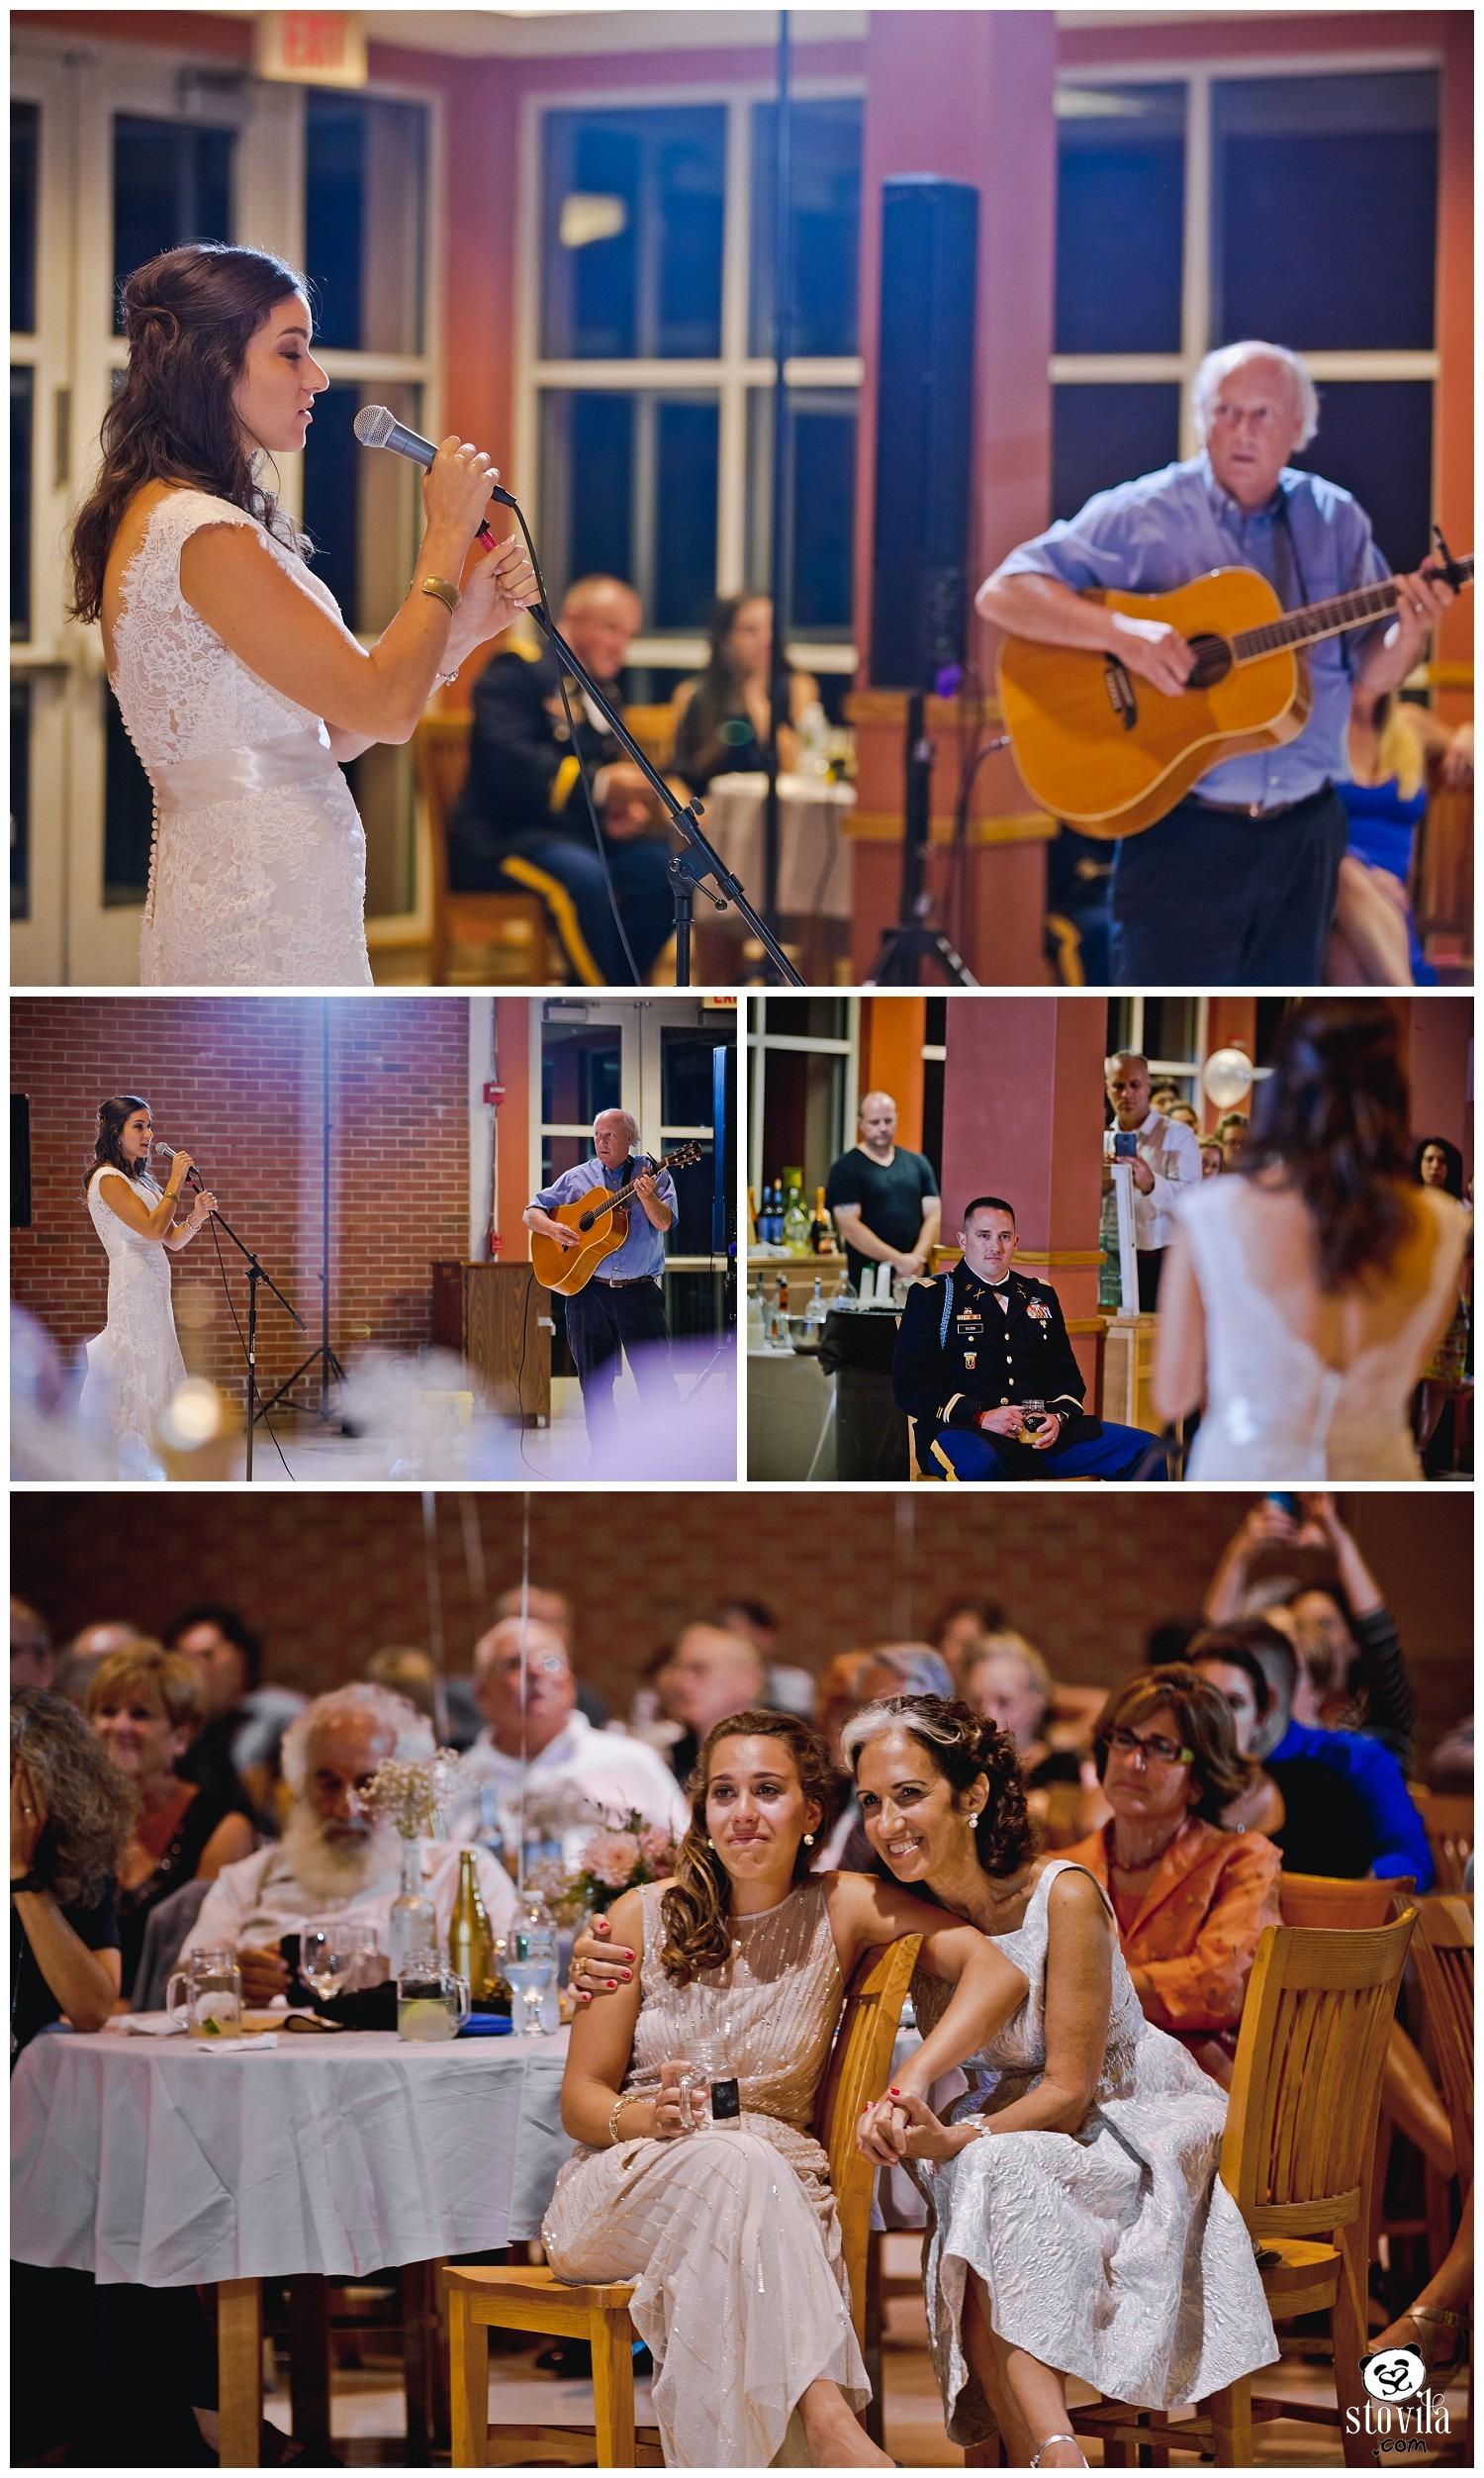 RD_Wedding_South Berwick University Maine - Stovila NH Photography (29)